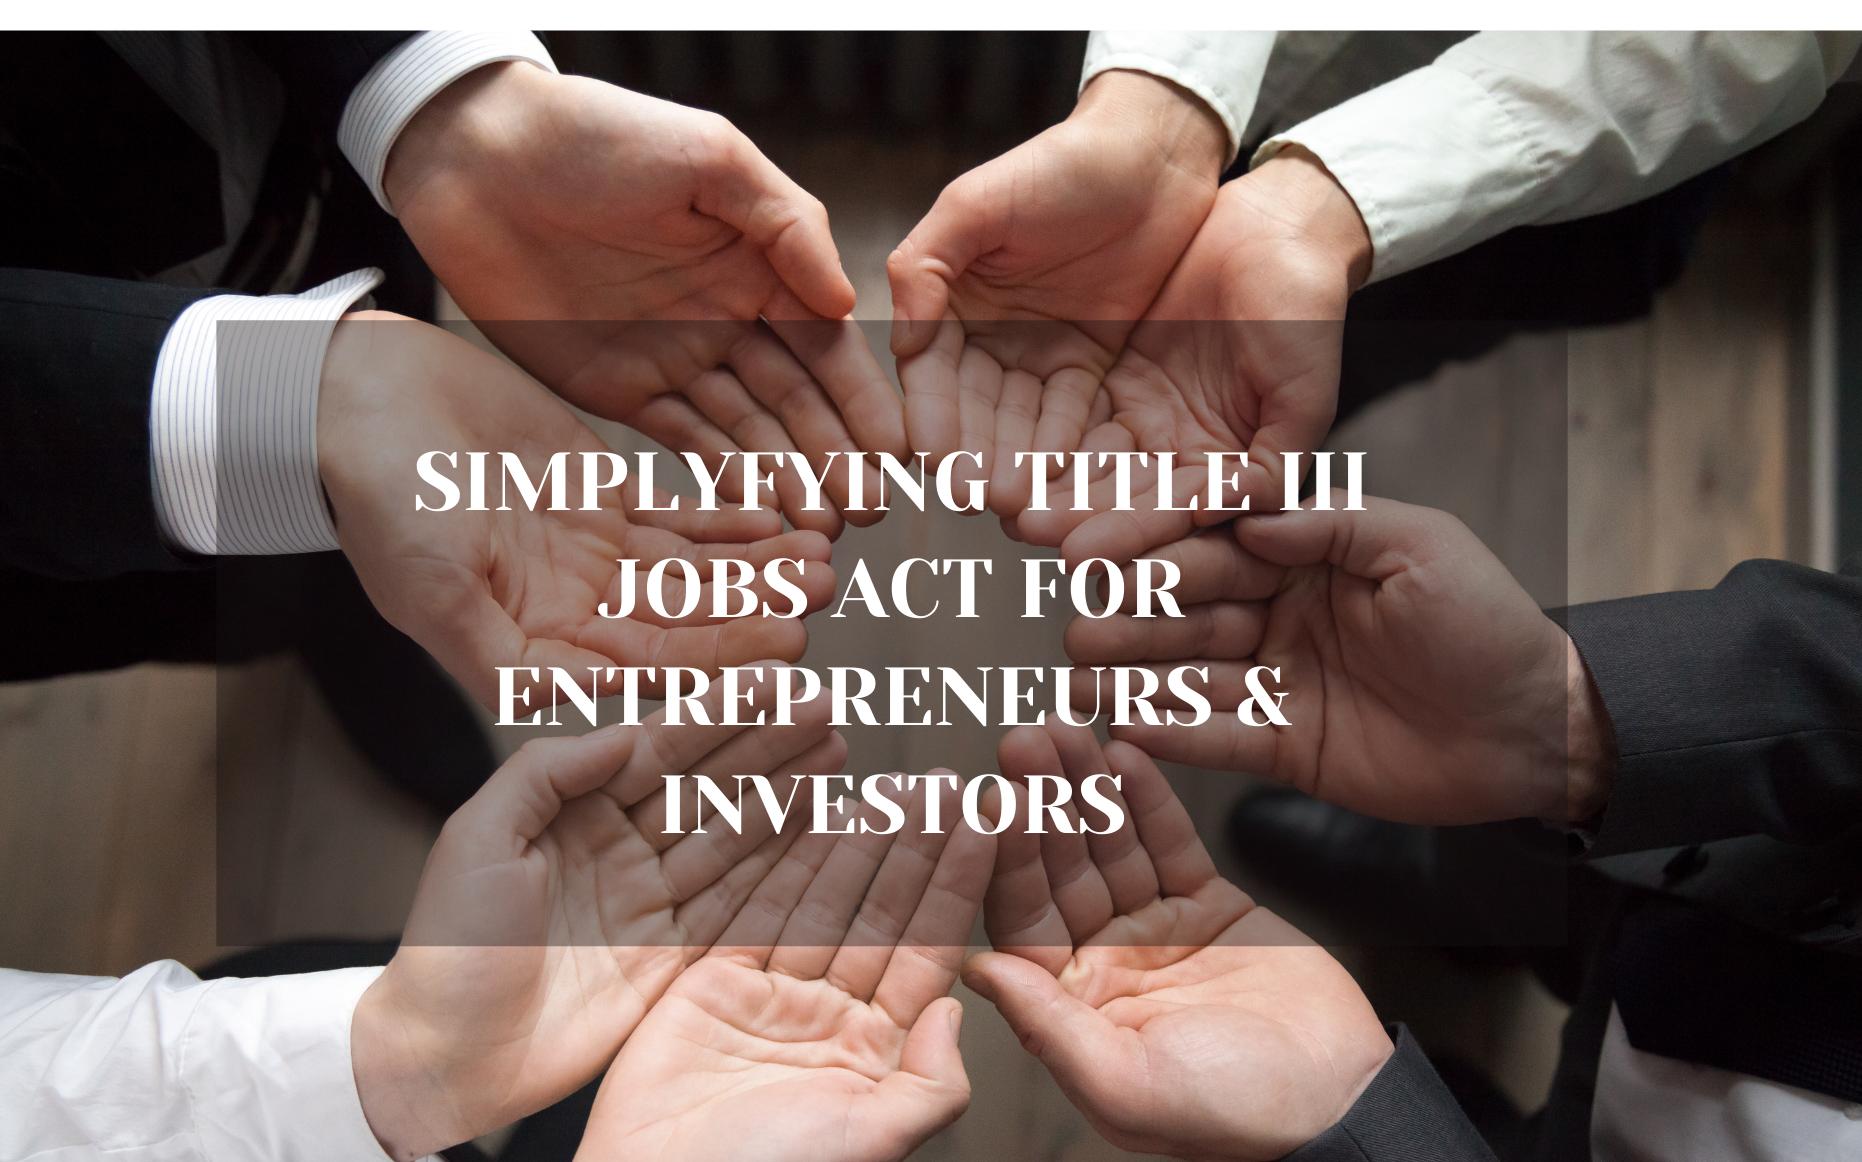 Title iii of the jobs act, Jobs act title iii equity crowdfunding, What is the jobs act, Jobs act title iii sec